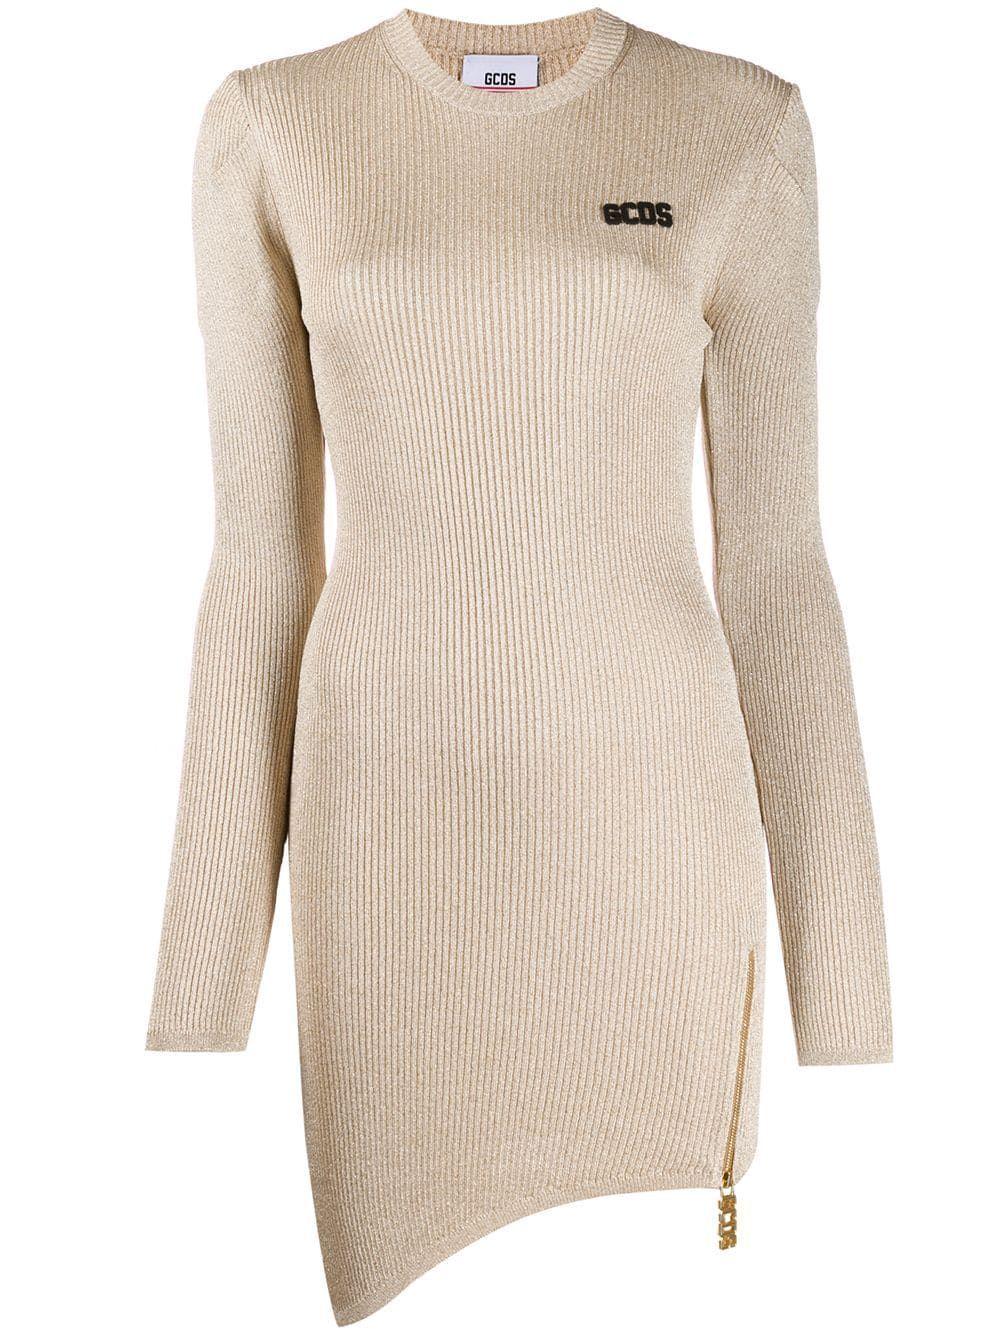 GCDS WOMEN'S FW20W02004816 GOLD VISCOSE DRESS